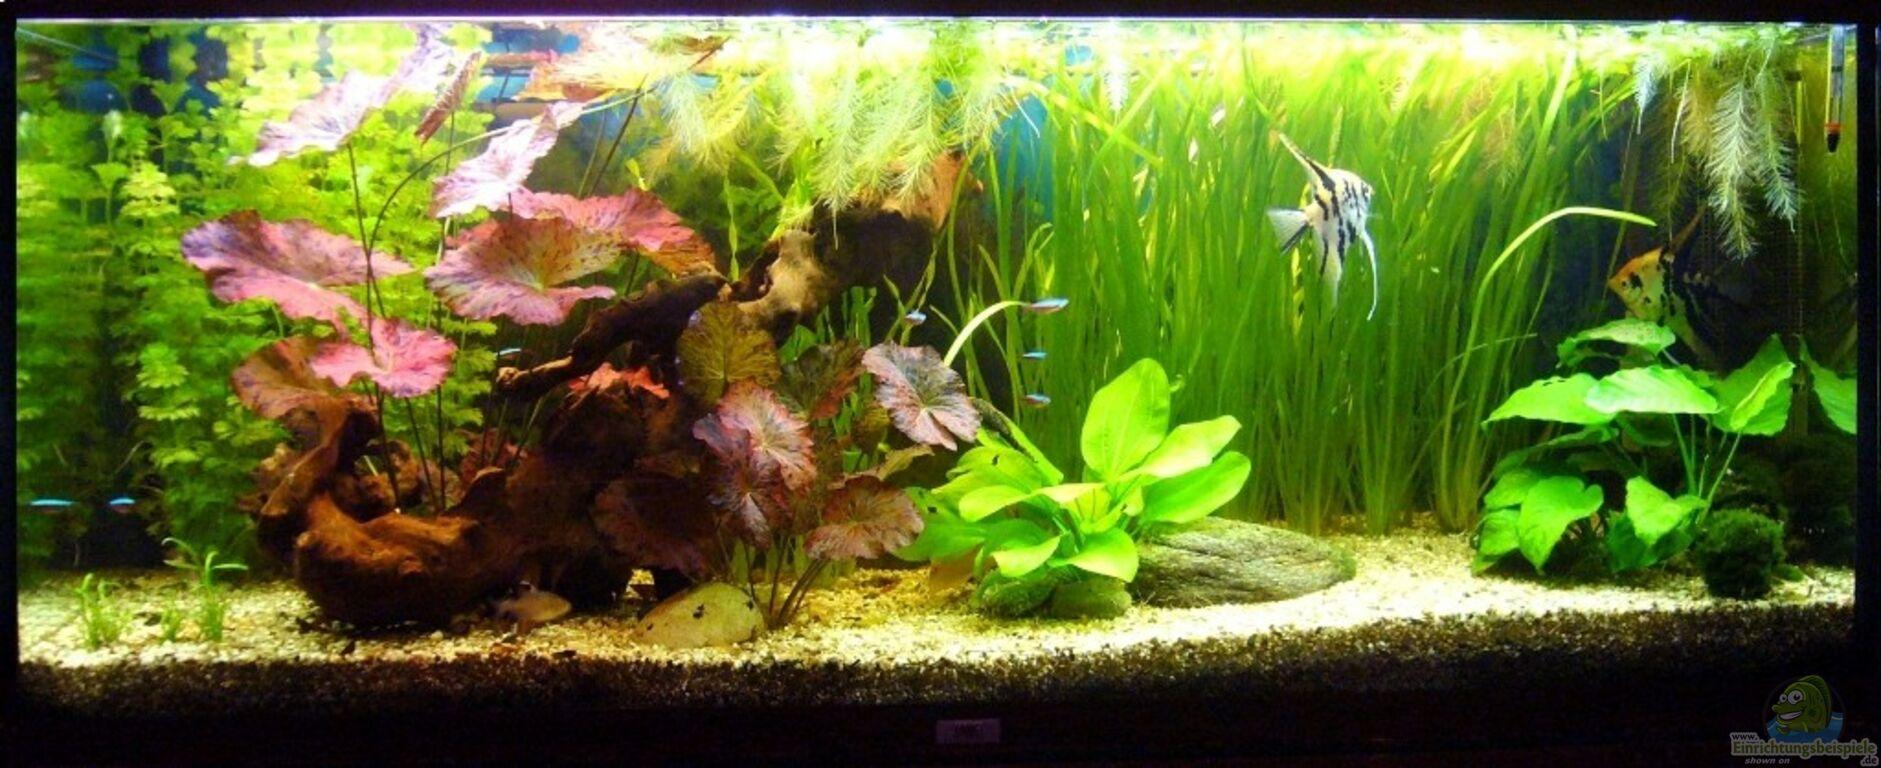 Aquarium von kim gesellschaftsbecken mit skalare for Skalar aquarium